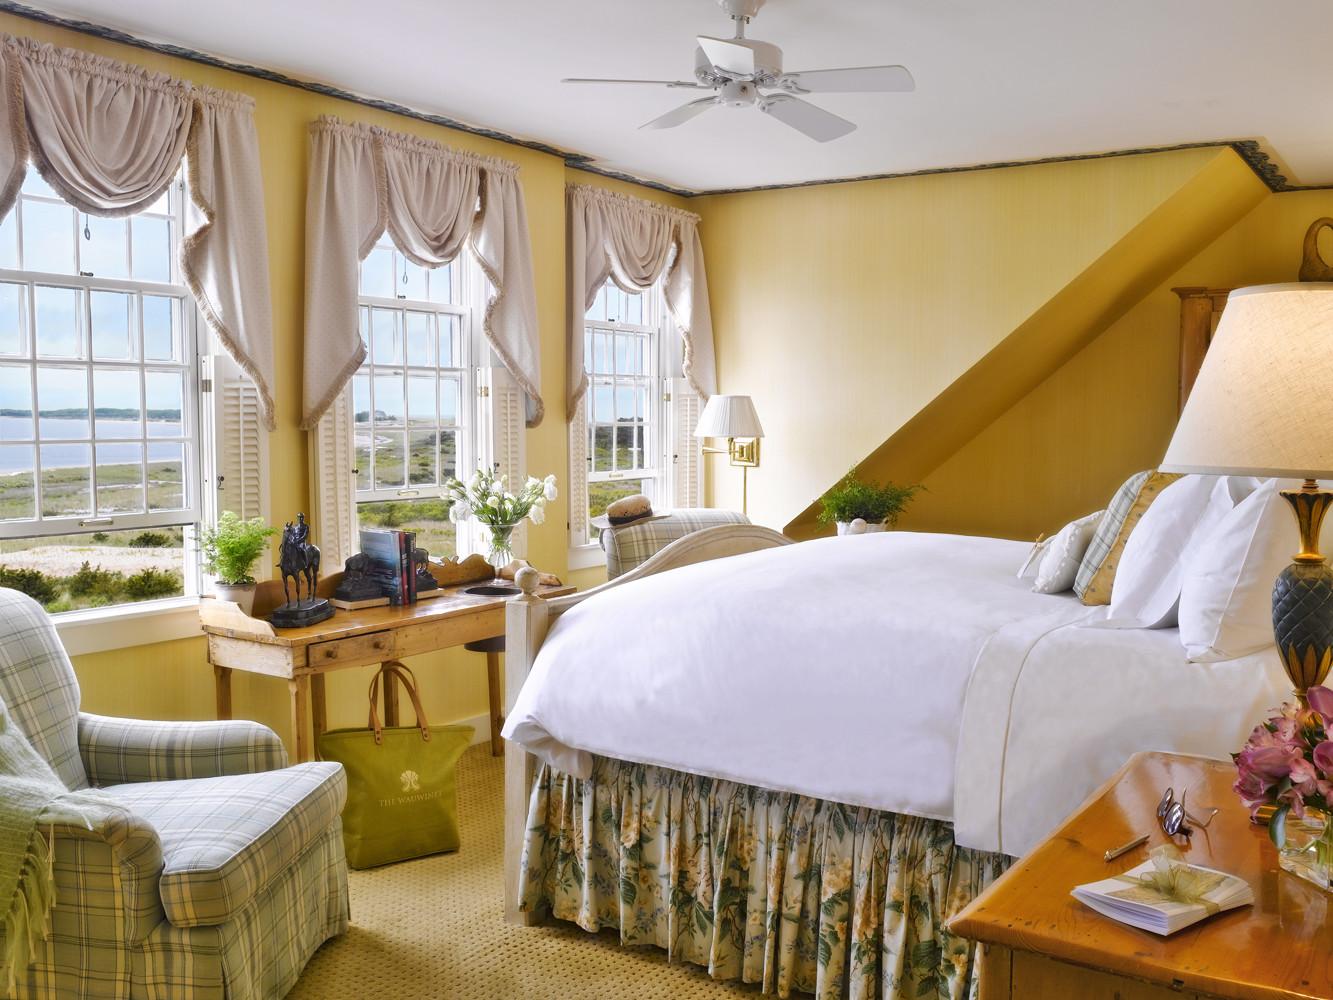 Bedroom at The Wauwinet